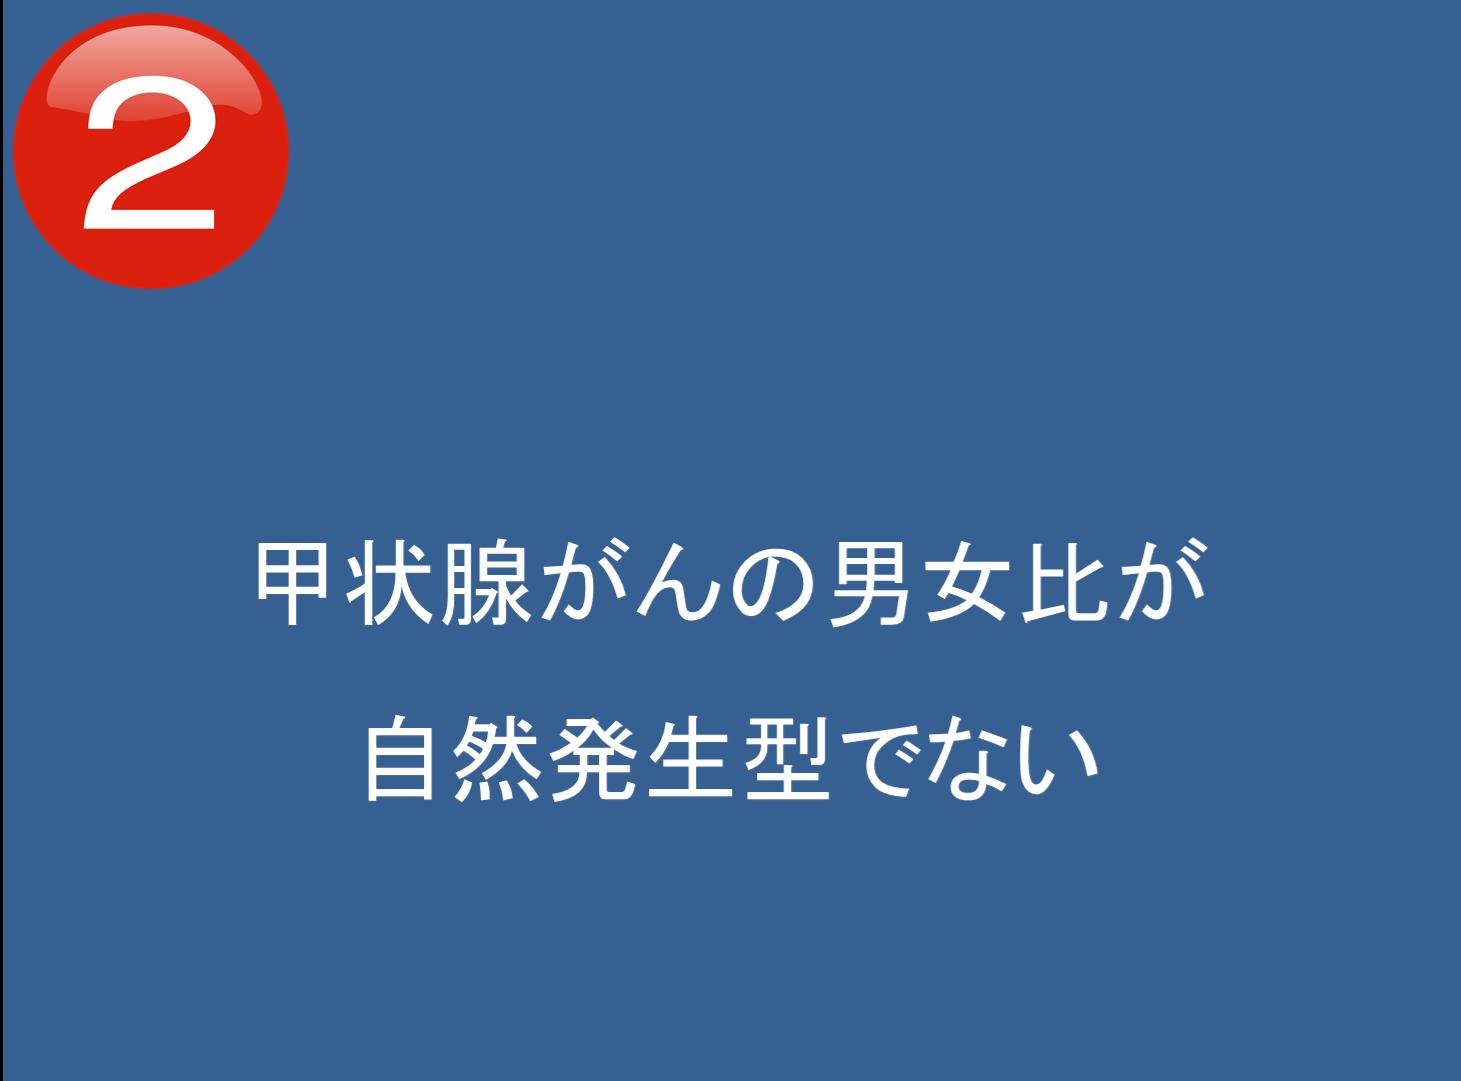 DrMatsuzaki016.png